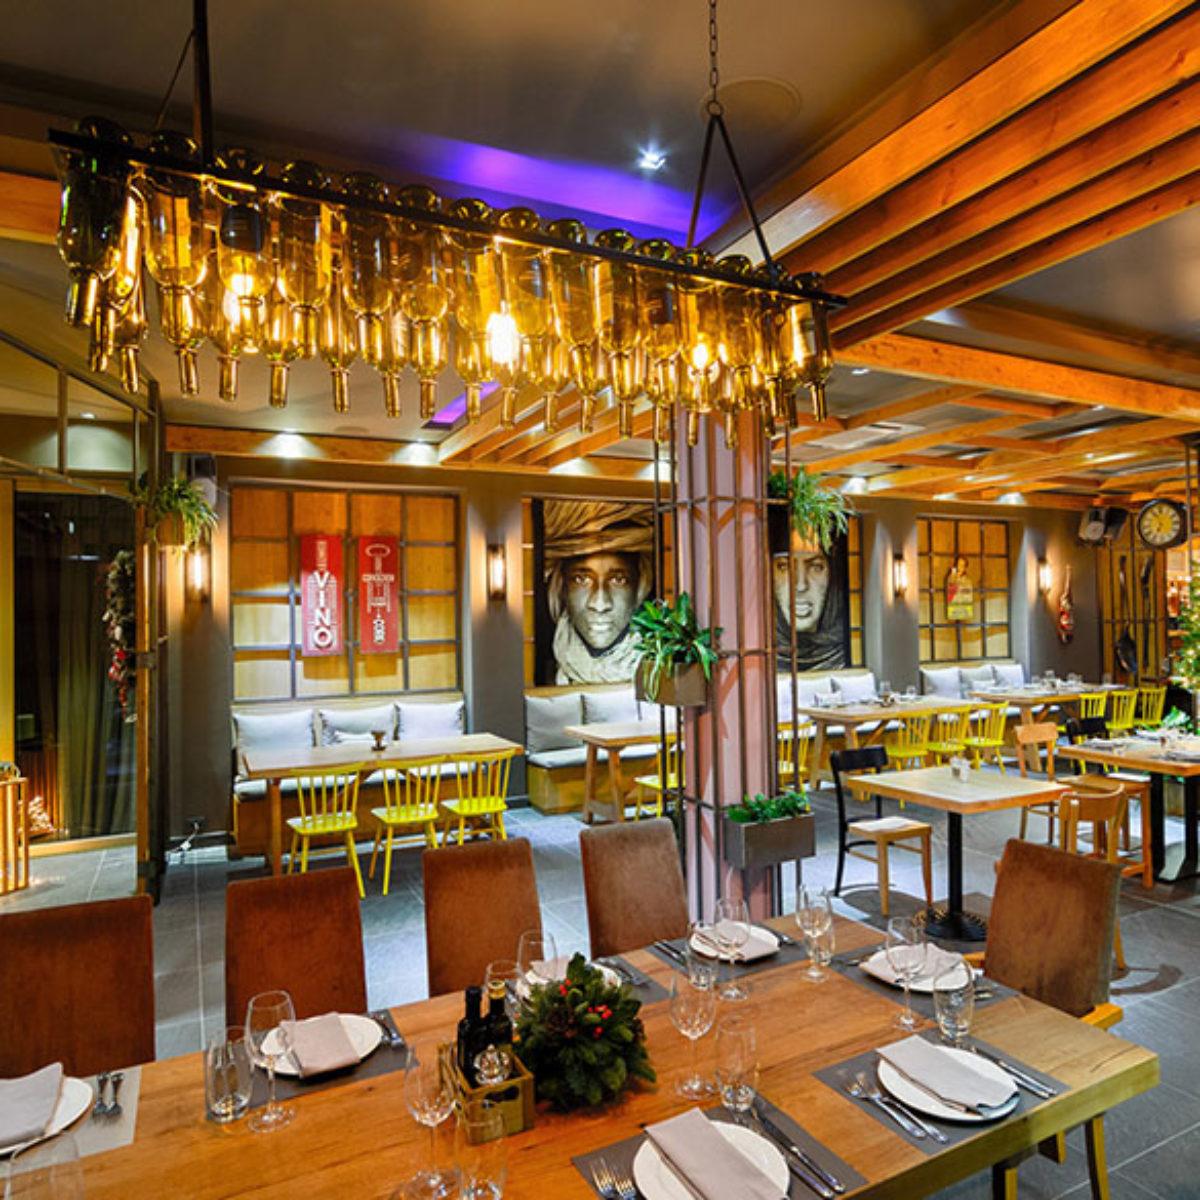 Yiamas Gastro Bar - Καλαμάτα - Μοντέρνα Ευρωπαϊκή Κουζίνα - Gallery 7